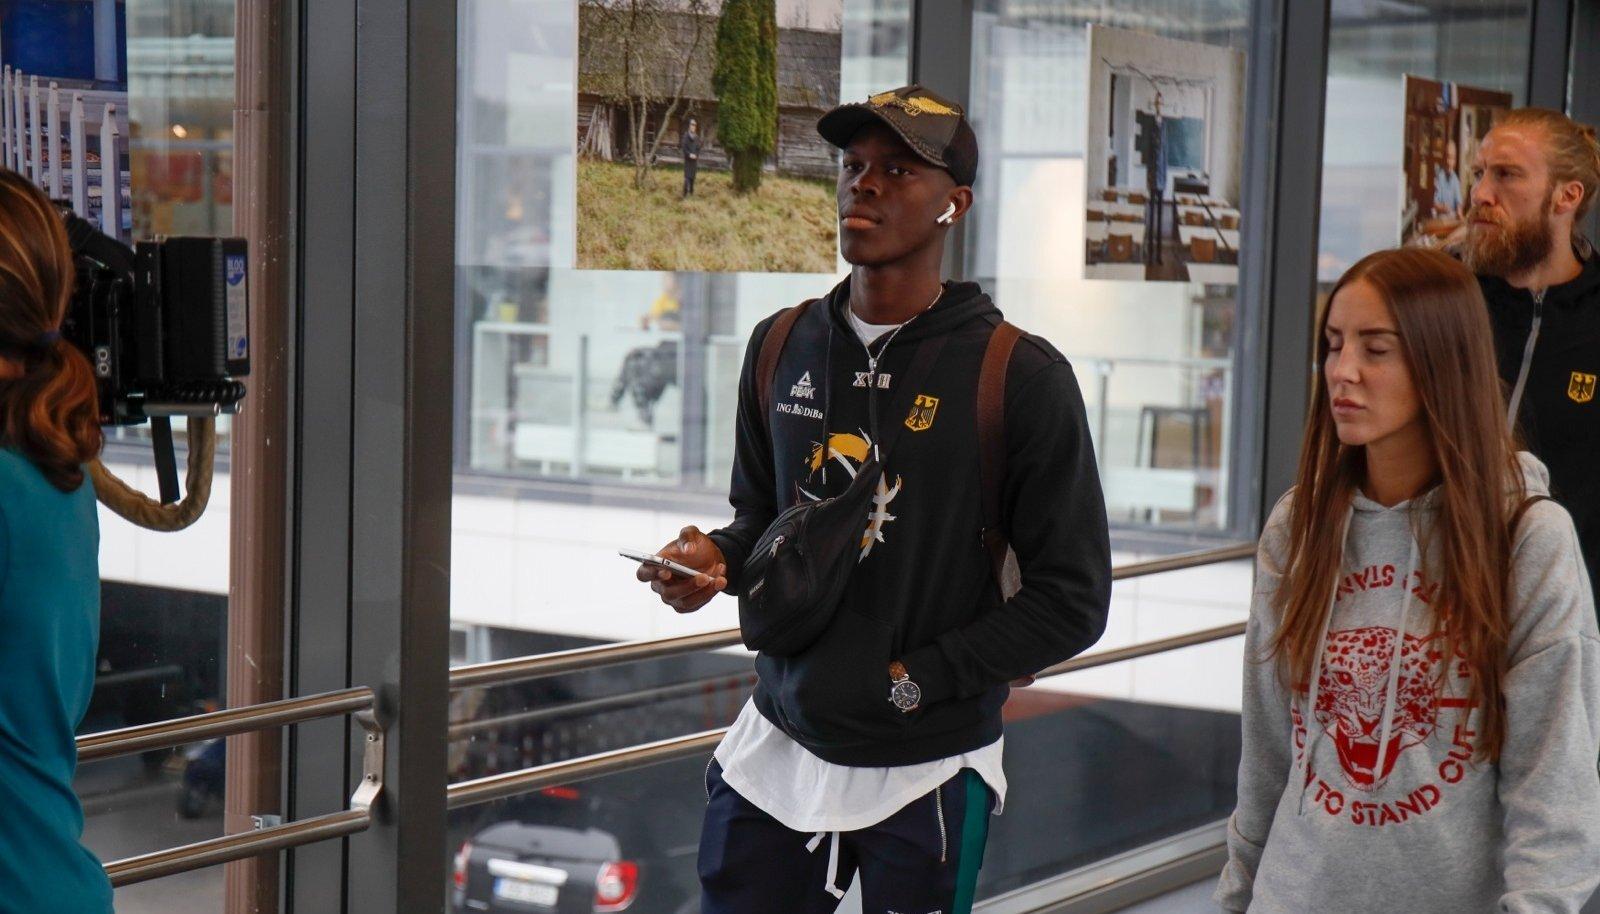 Saksa korvpallikoondis saabus Tallinna, pildil Dennis Schröder